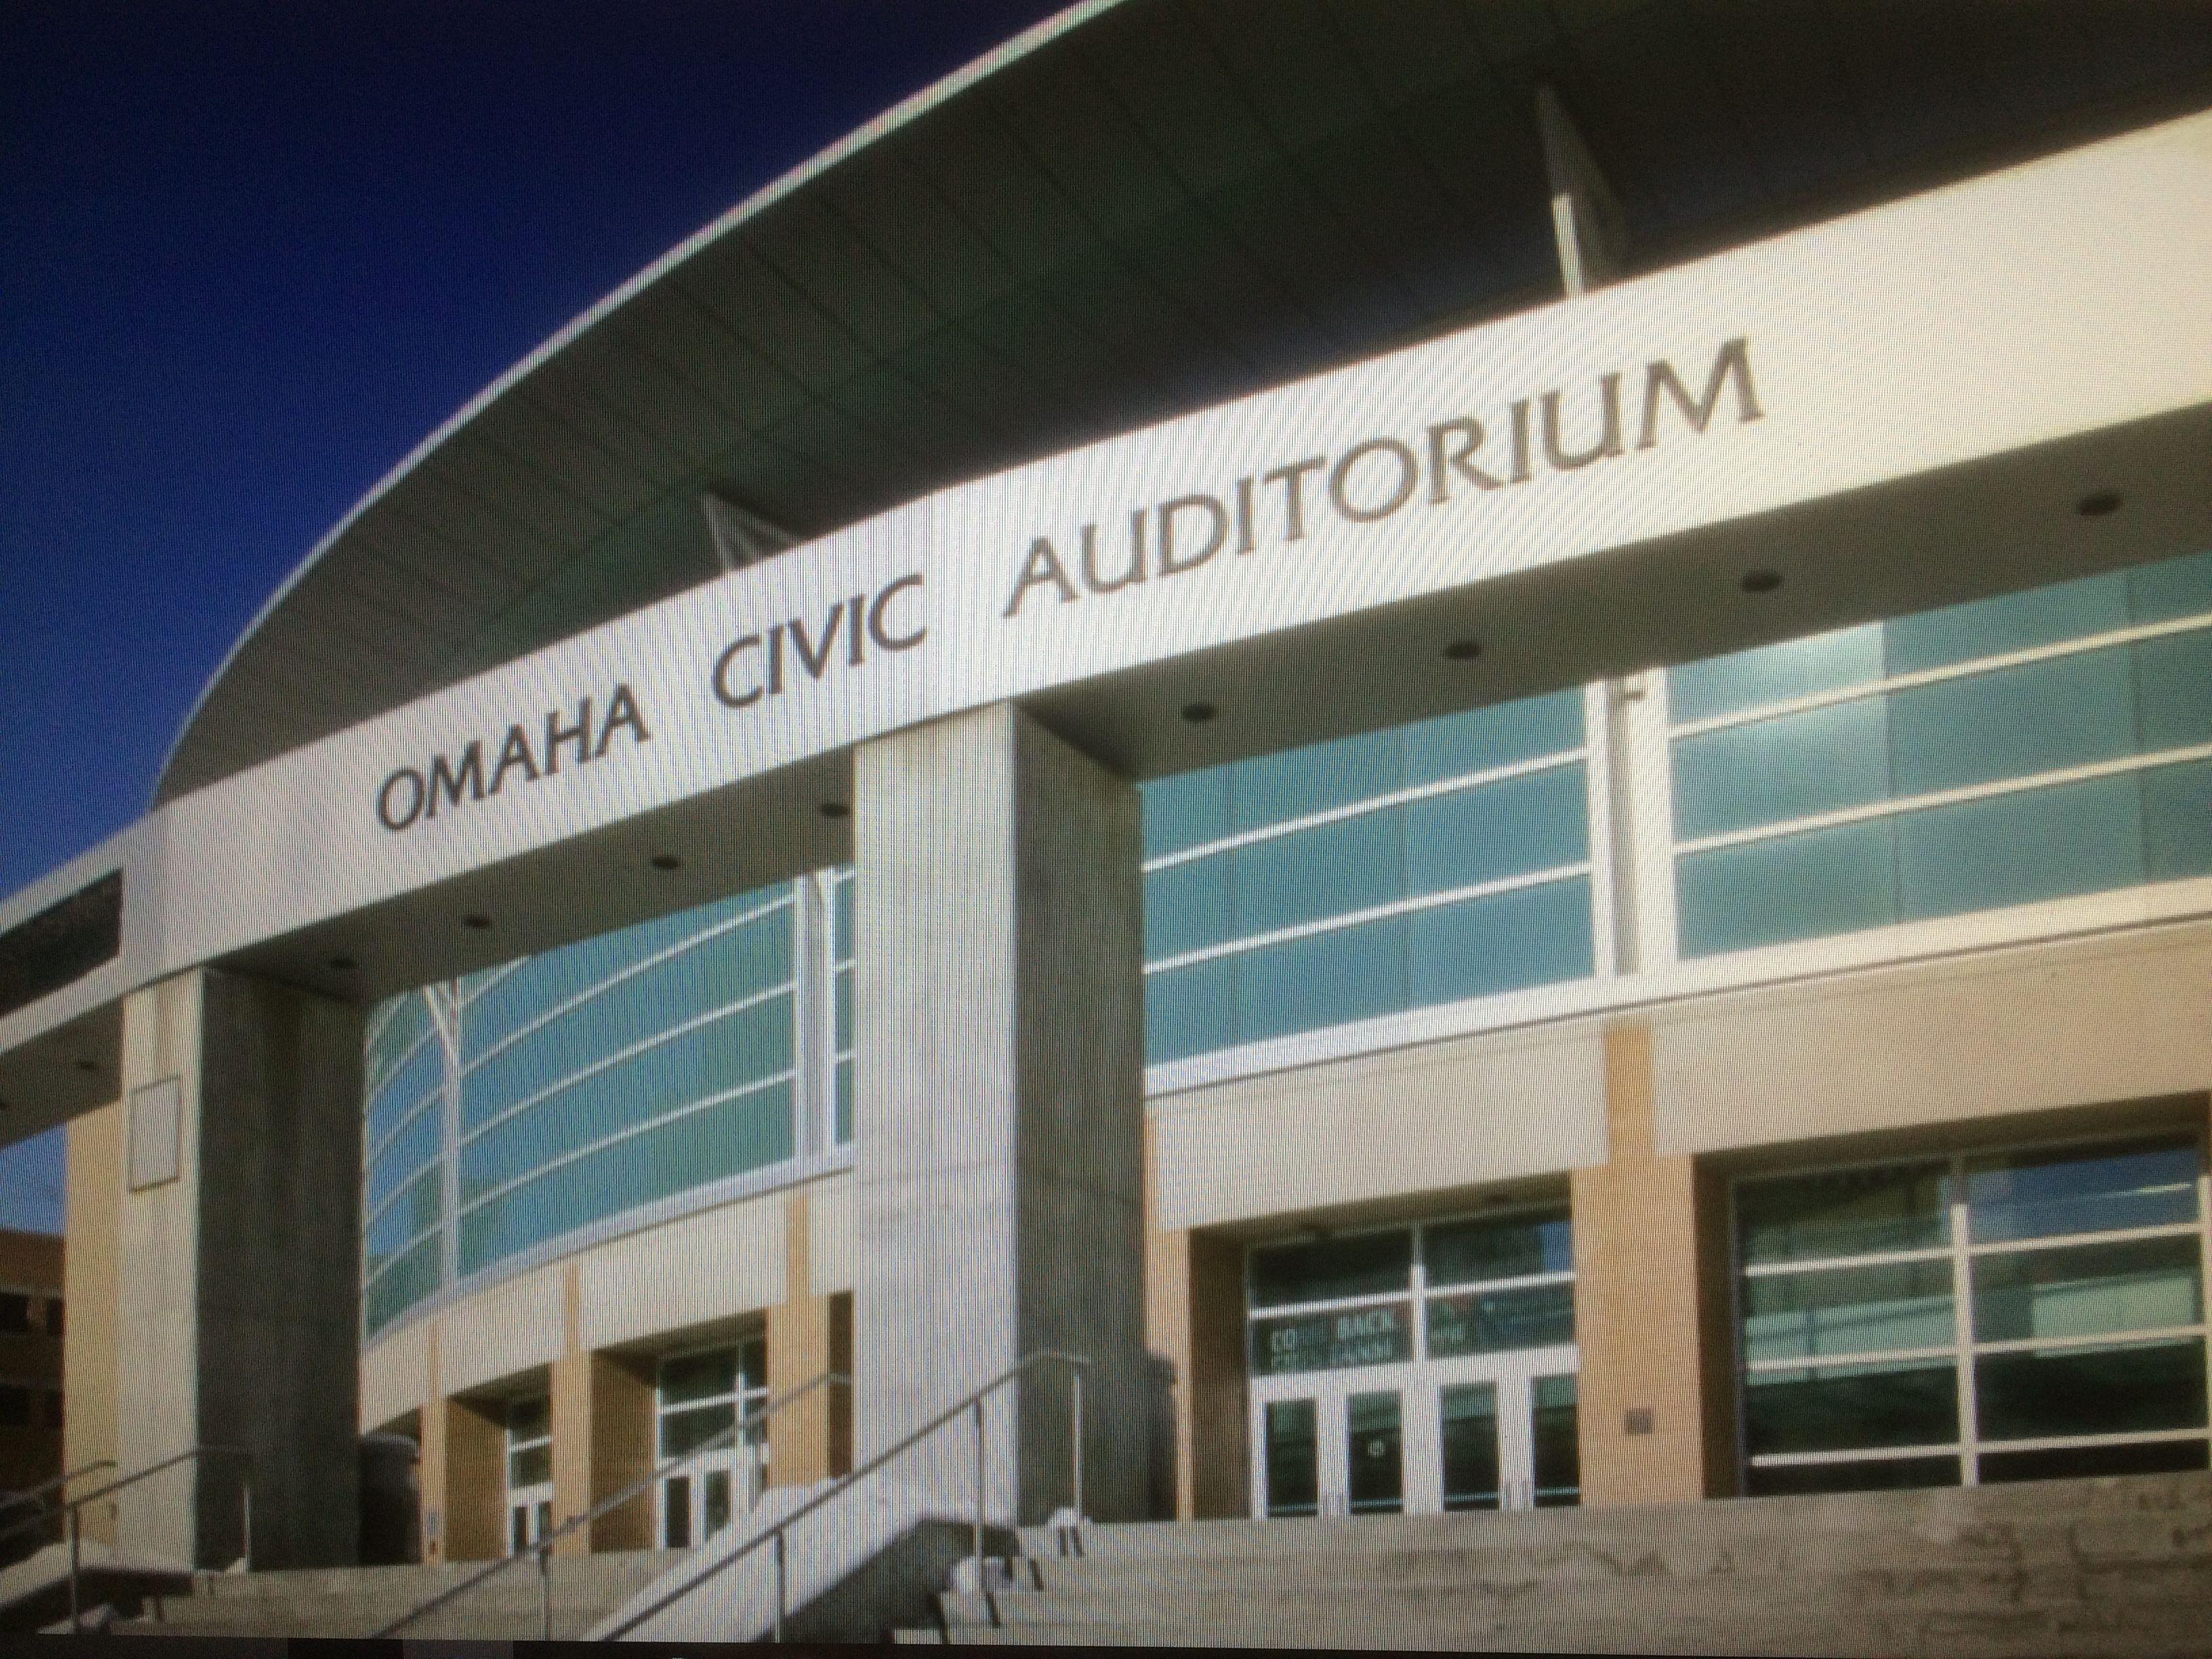 Good bye to omaha civic auditorium elvis has left the